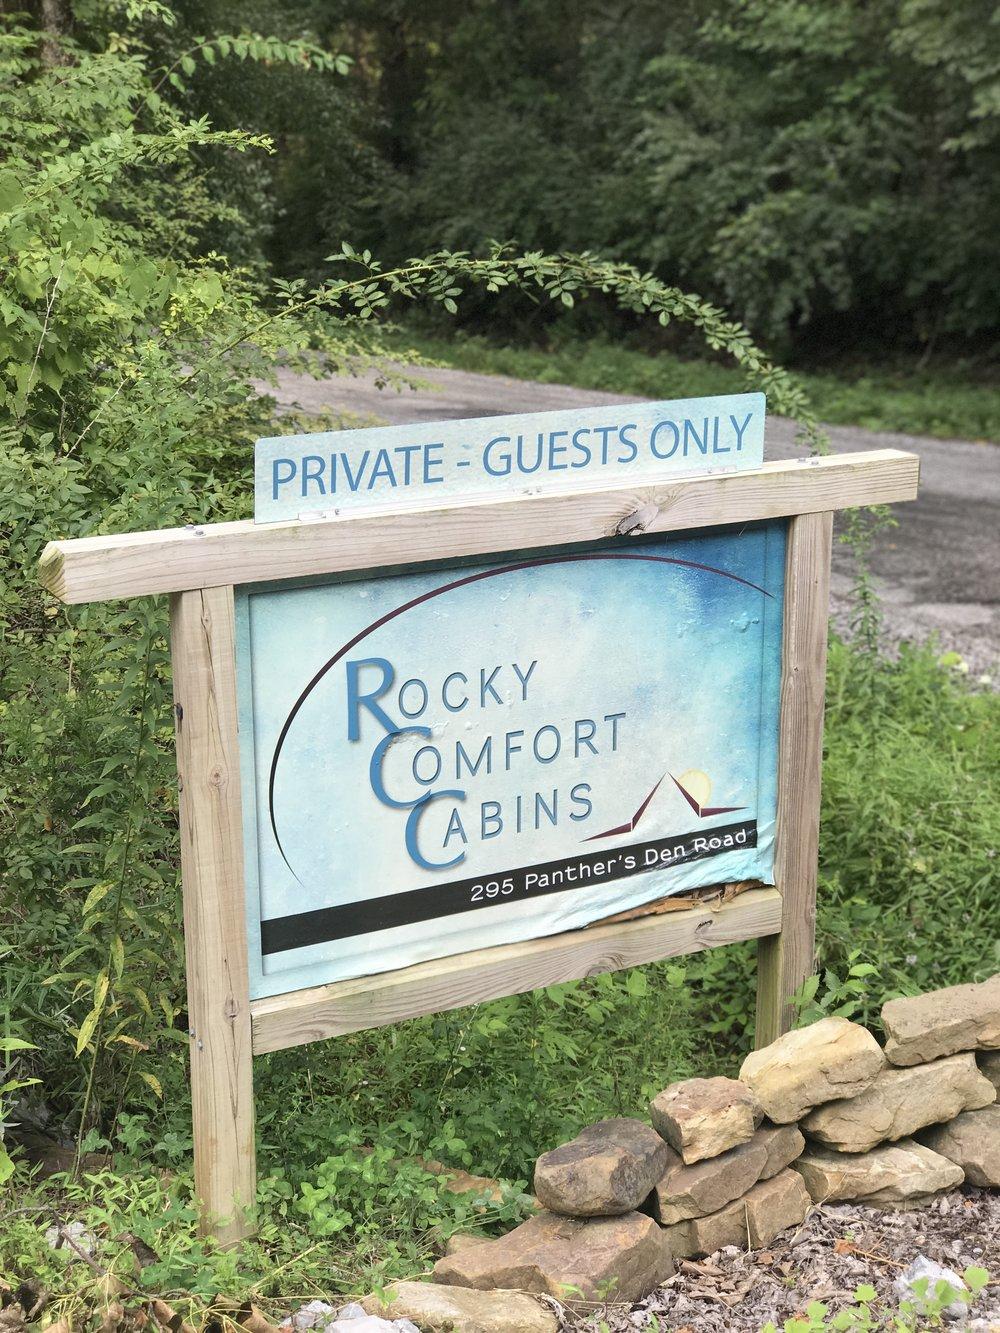 rocky-comfort-cabins-glamping-dayna-bolden.jpg